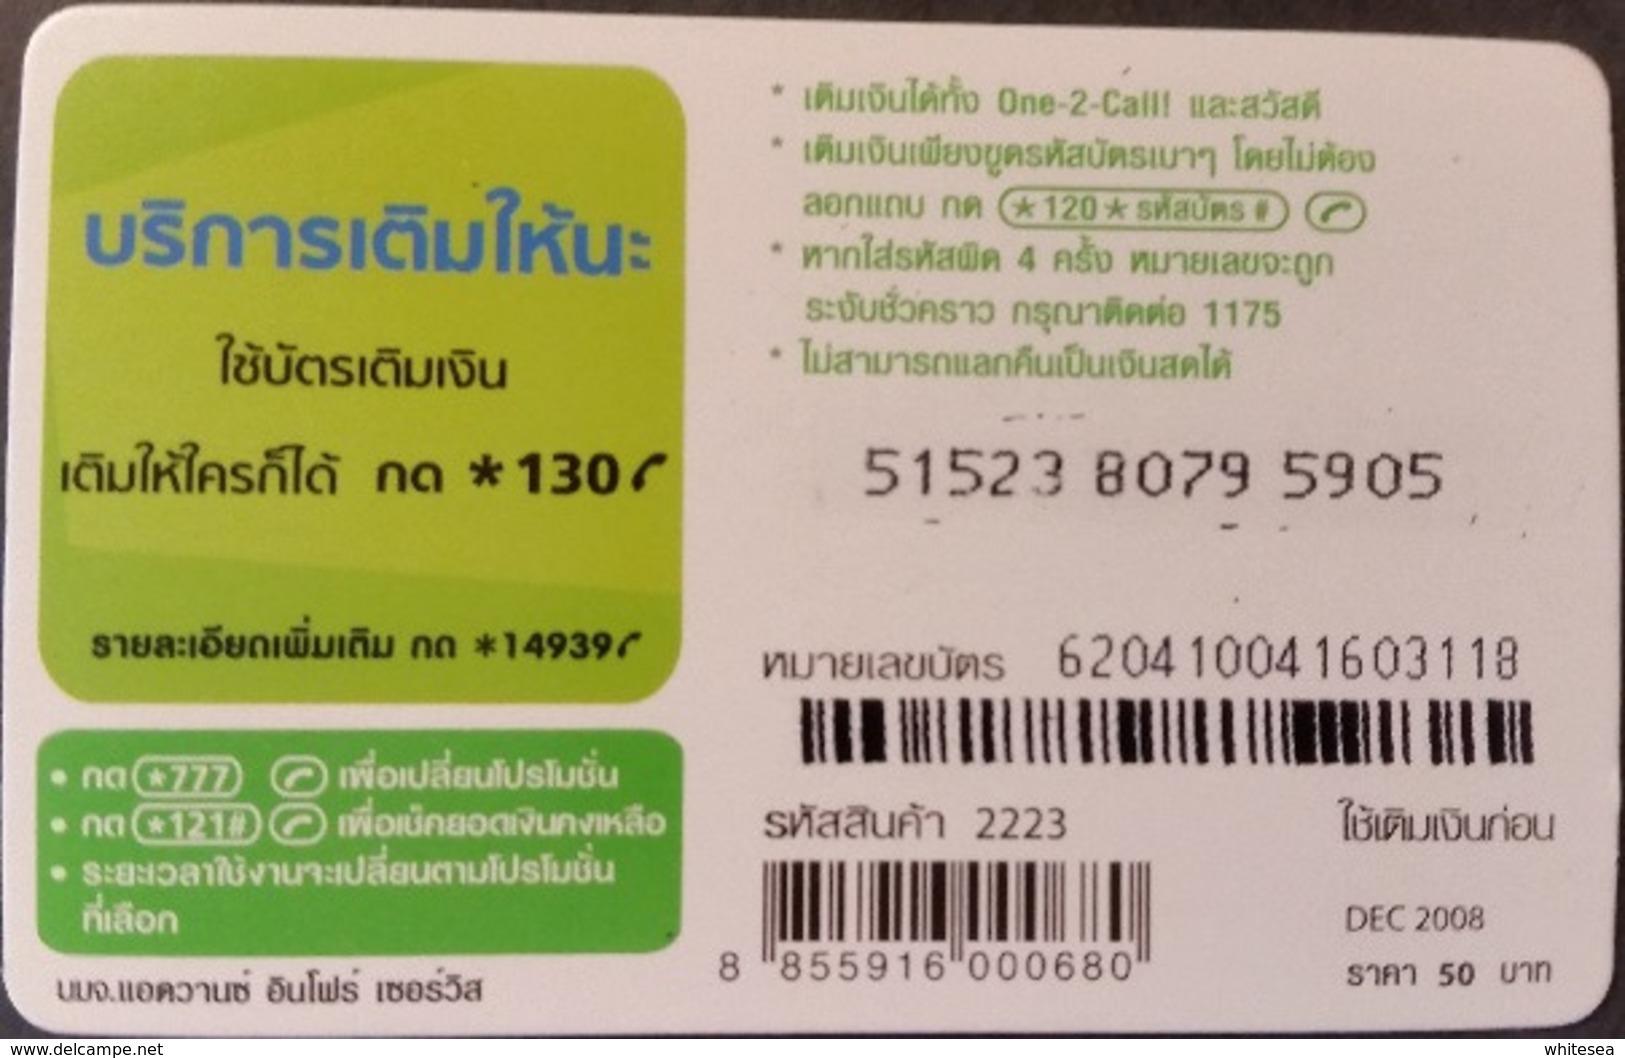 Mobilecard Thailand - 12Call / AIS - Taucherbrille & Schnorchel (1) - Thailand